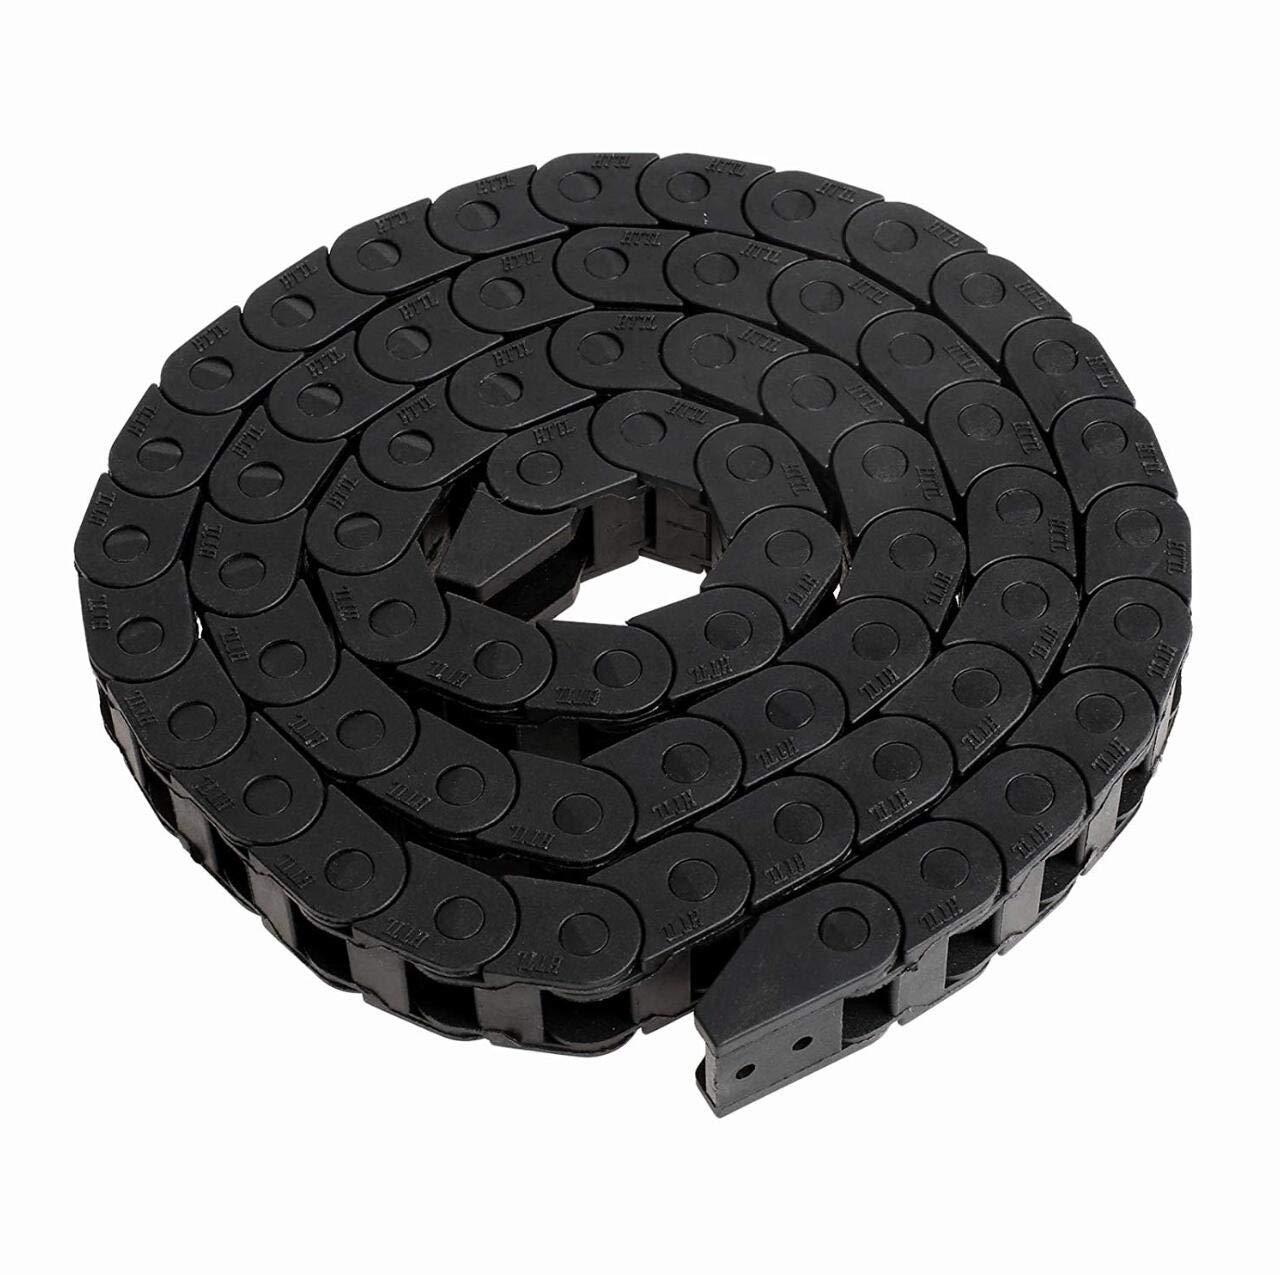 1M Hochwertige Energiekette Schleppkette Kunststoff Towline Kabel Tr/äger Schleppkette f/ür 3D Drucker CNC 10 X 10mm